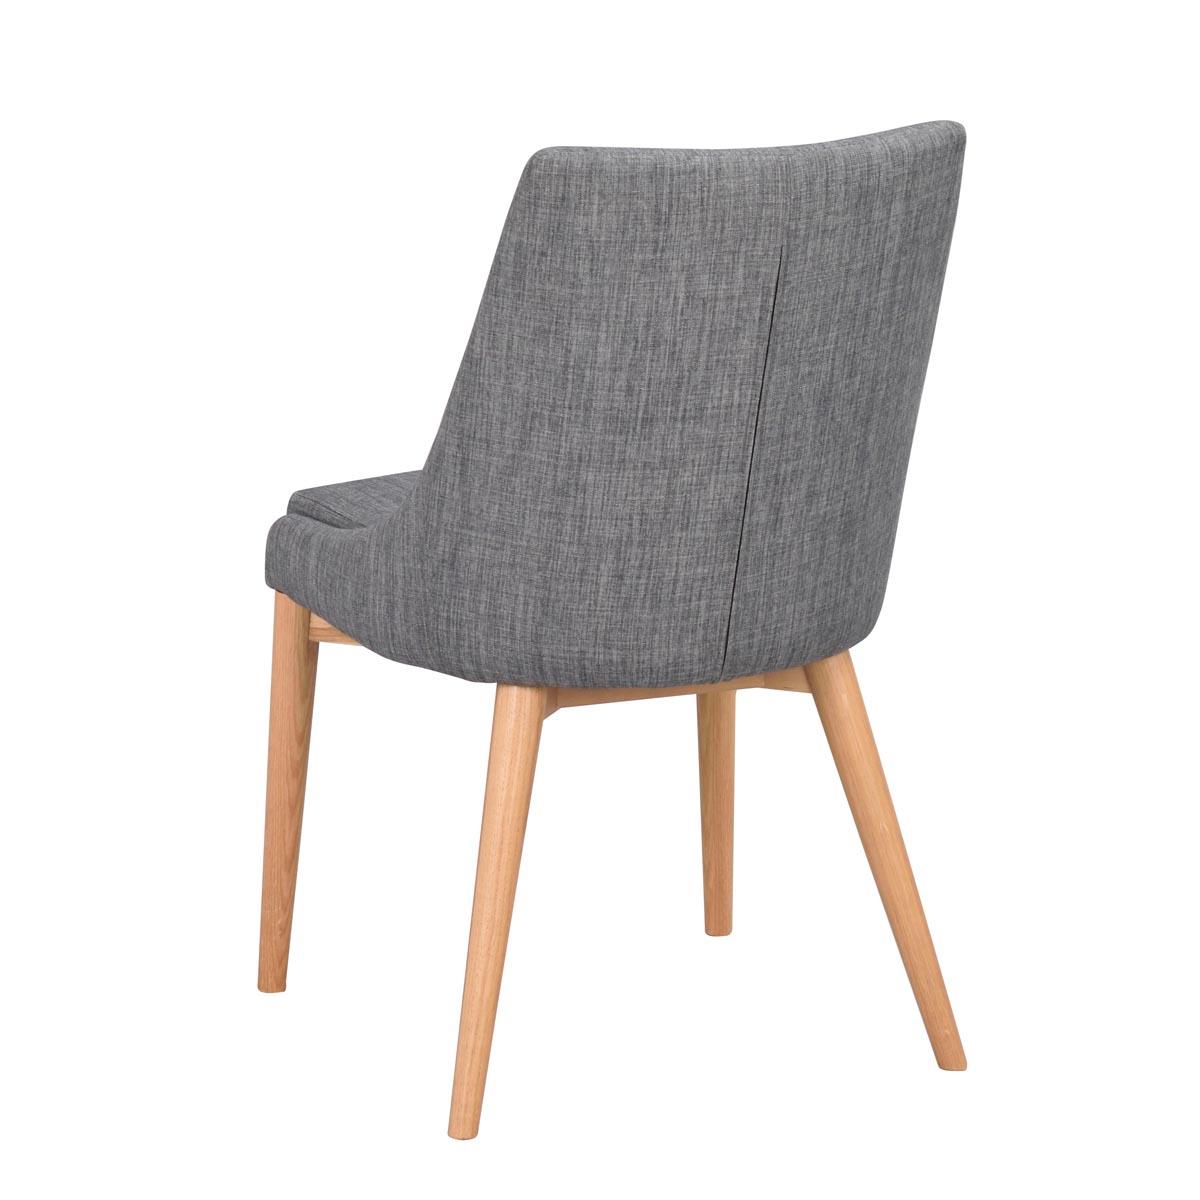 Bea-stol-mörkgrått-tyg_ekR-118321_d